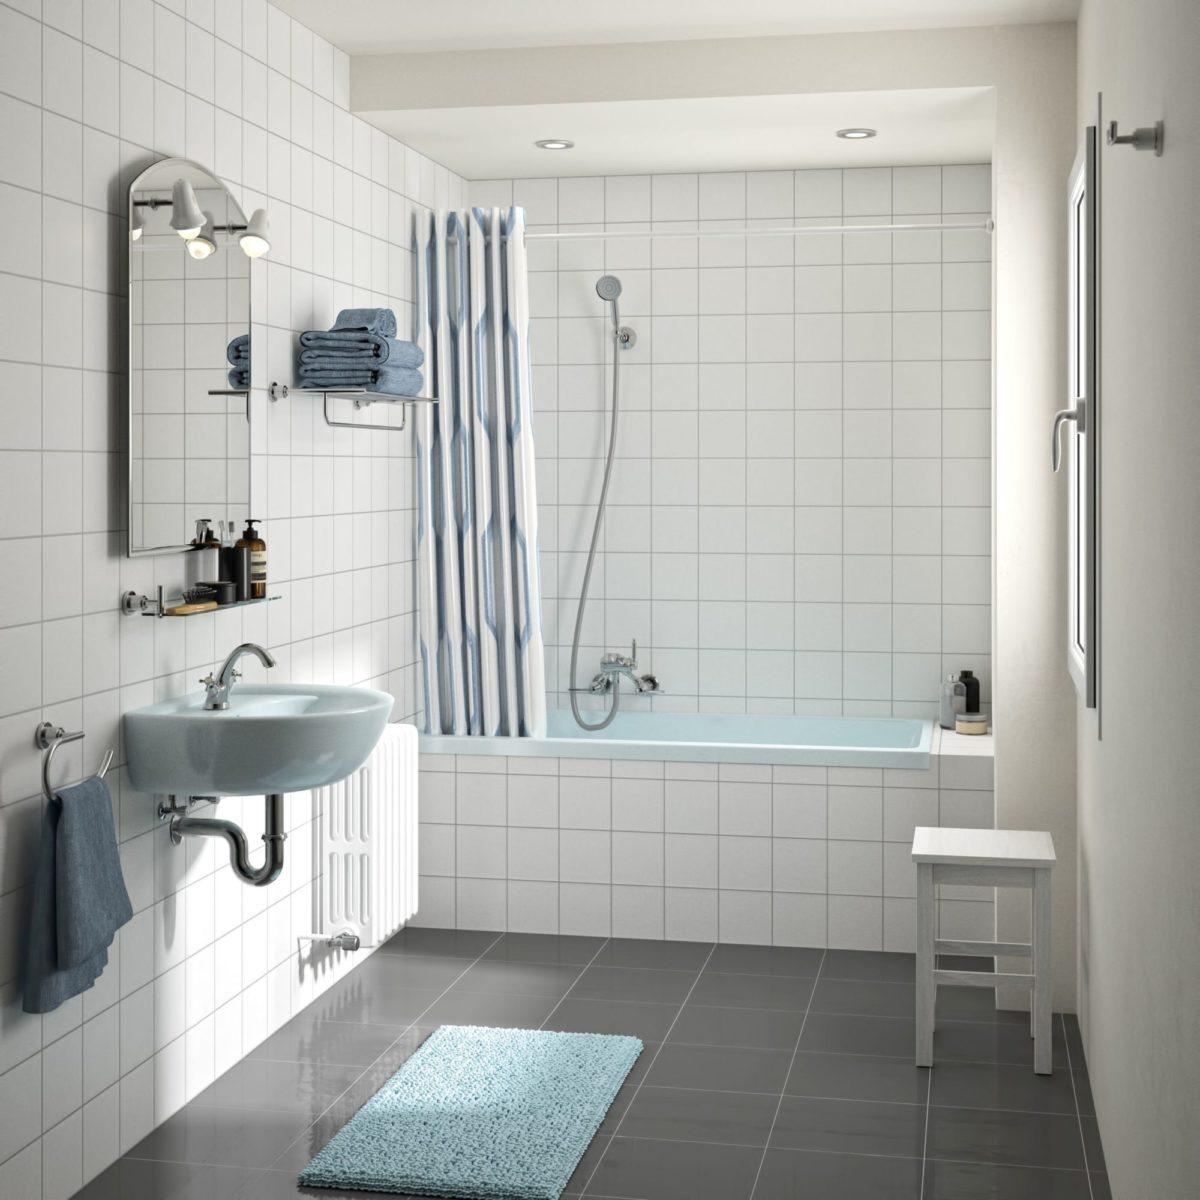 33repabad-gmbh_altes-badezimmer-1200x1200.jpg